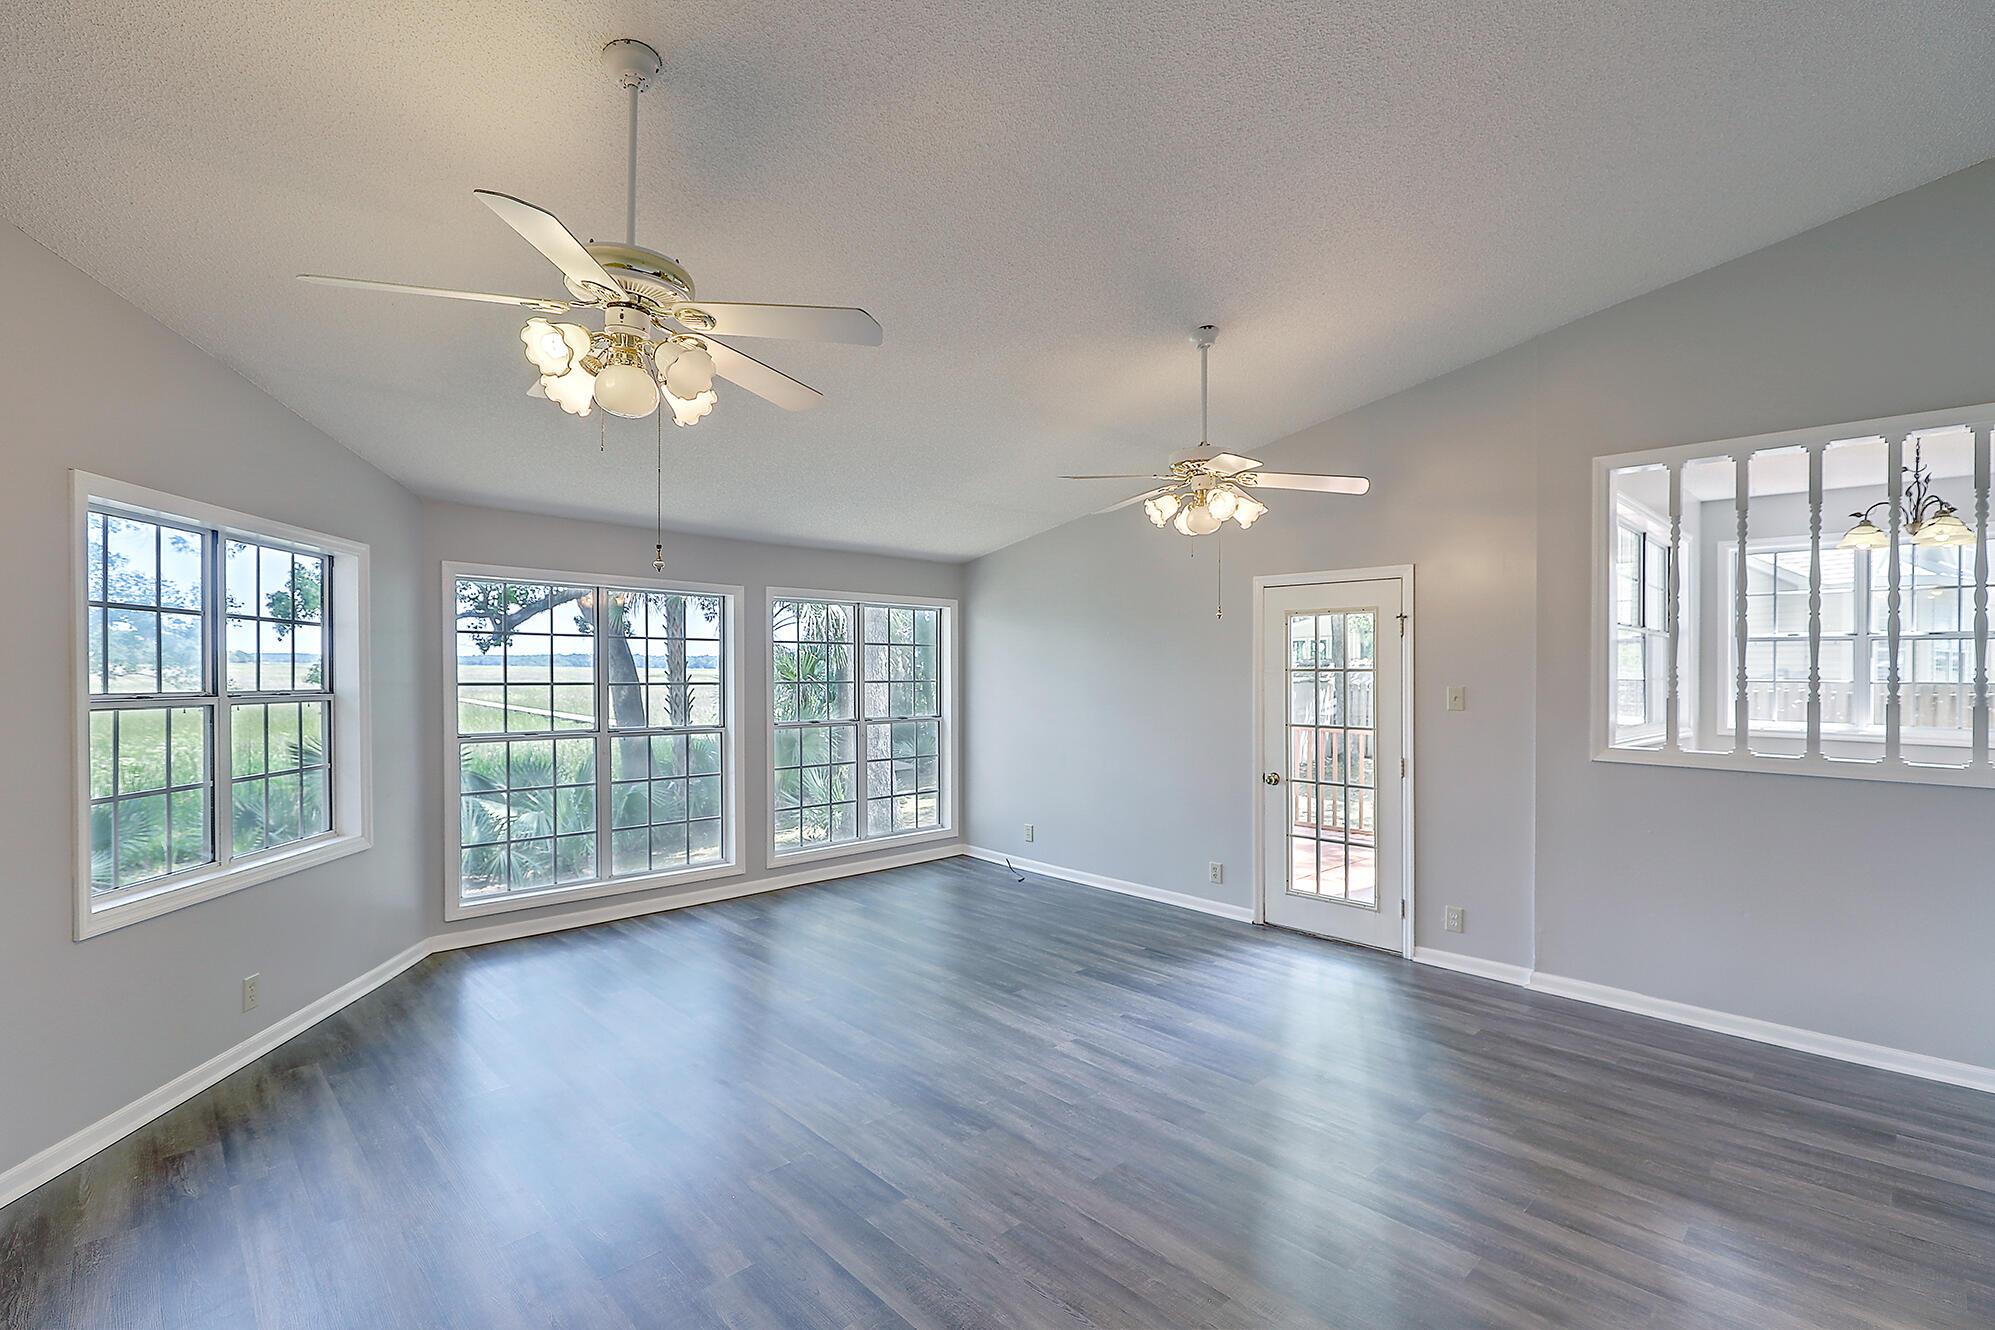 Appian Landing Homes For Sale - 8262 Longridge, North Charleston, SC - 37